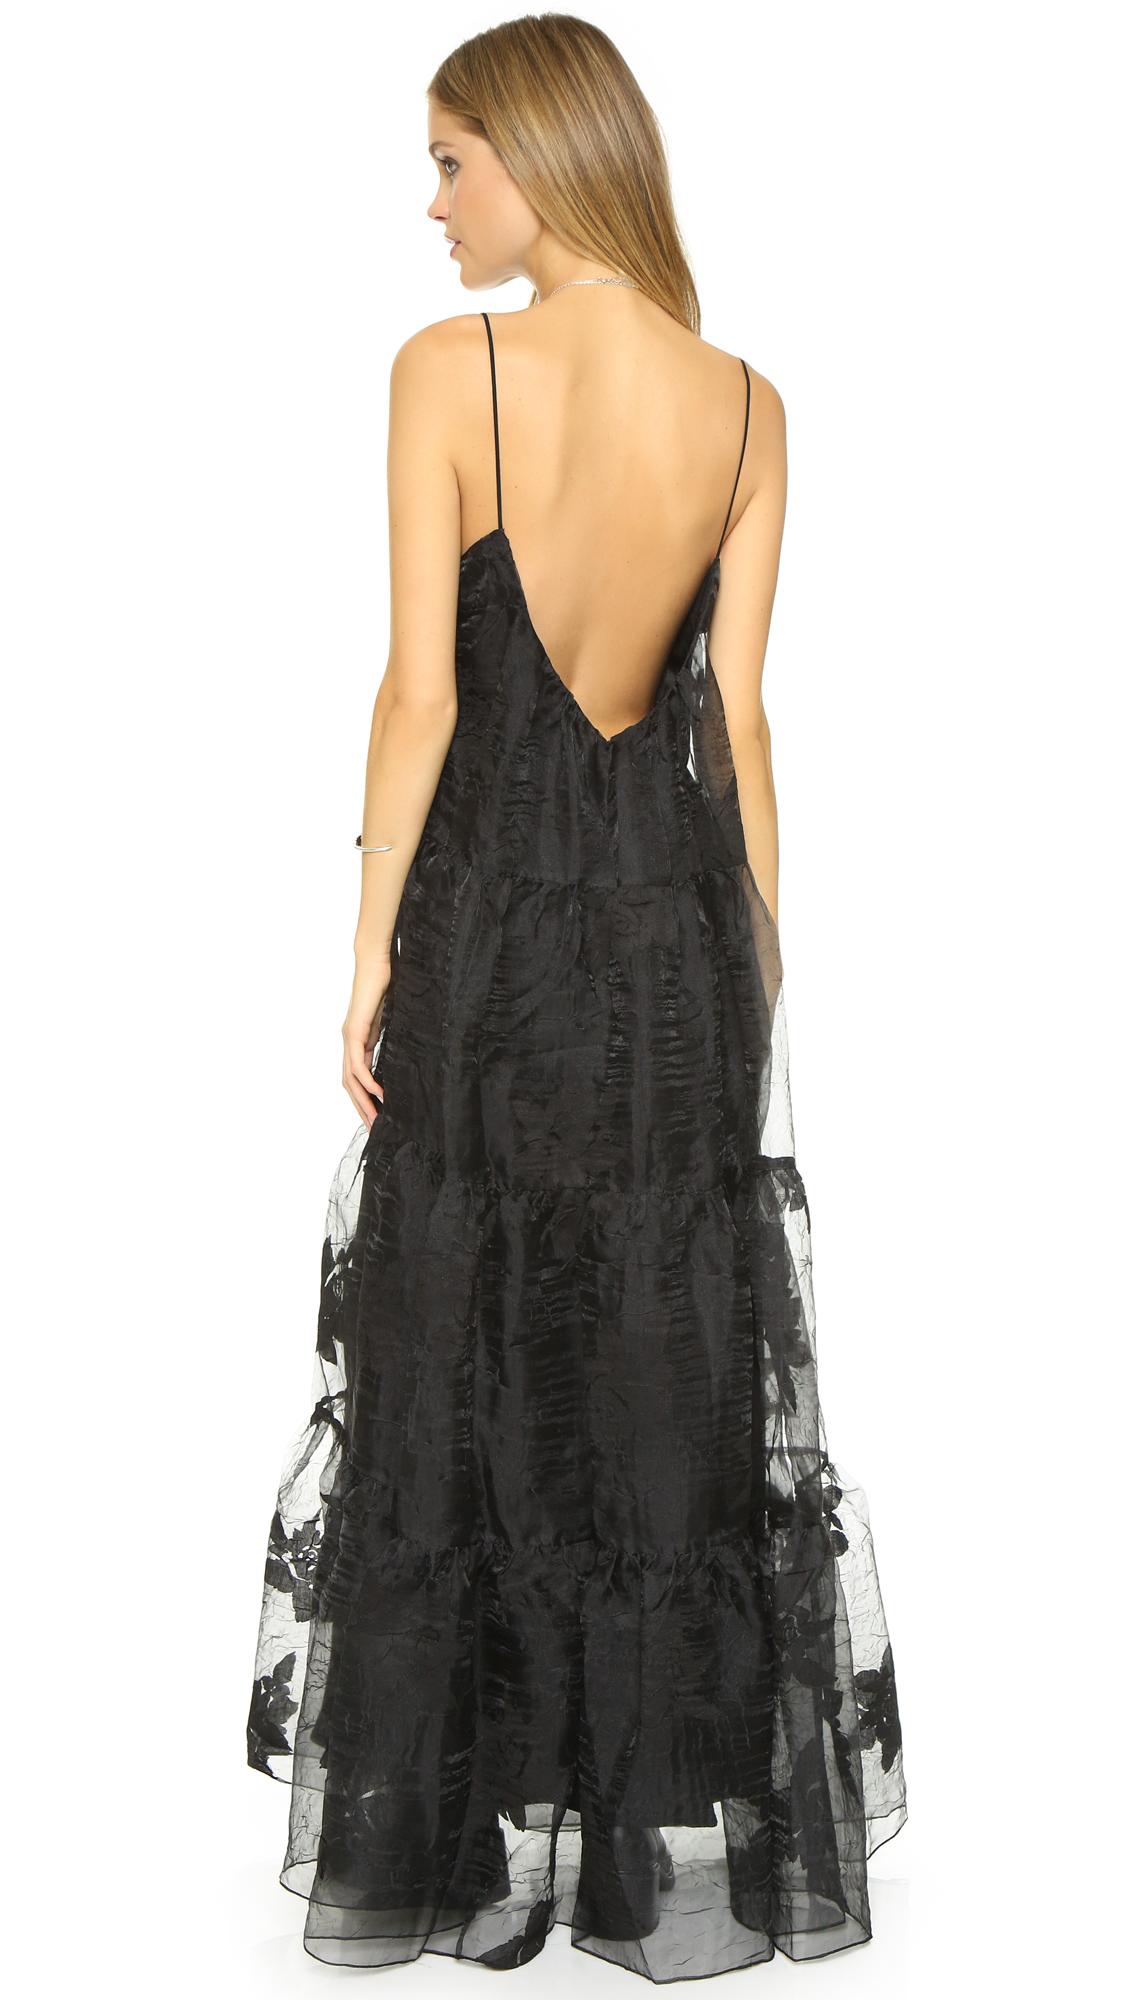 6de995f39c Tiered Floral Maxi Dress Amazon - Gomes Weine AG